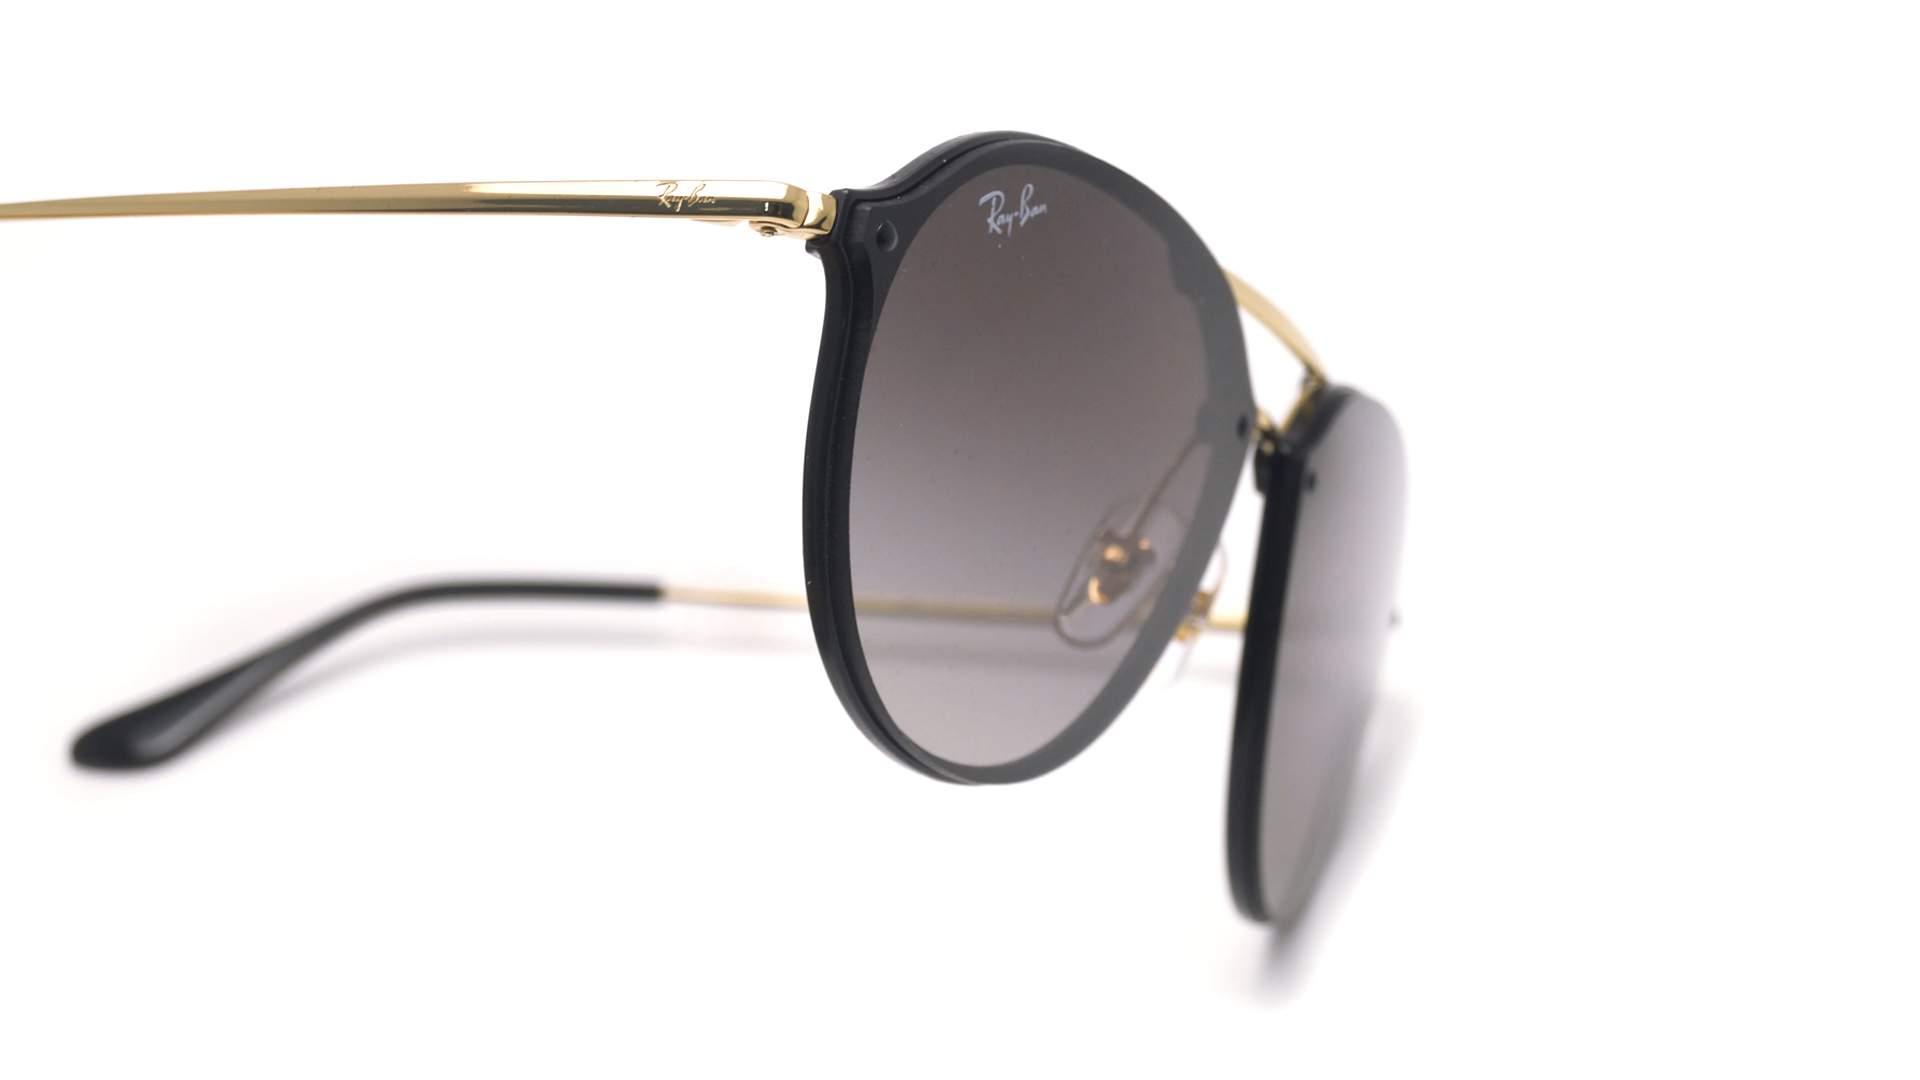 77d6e45949e54 Sunglasses Ray-Ban Blaze Double Bridge Black RB4292N 601 11 62-14 Large  Gradient